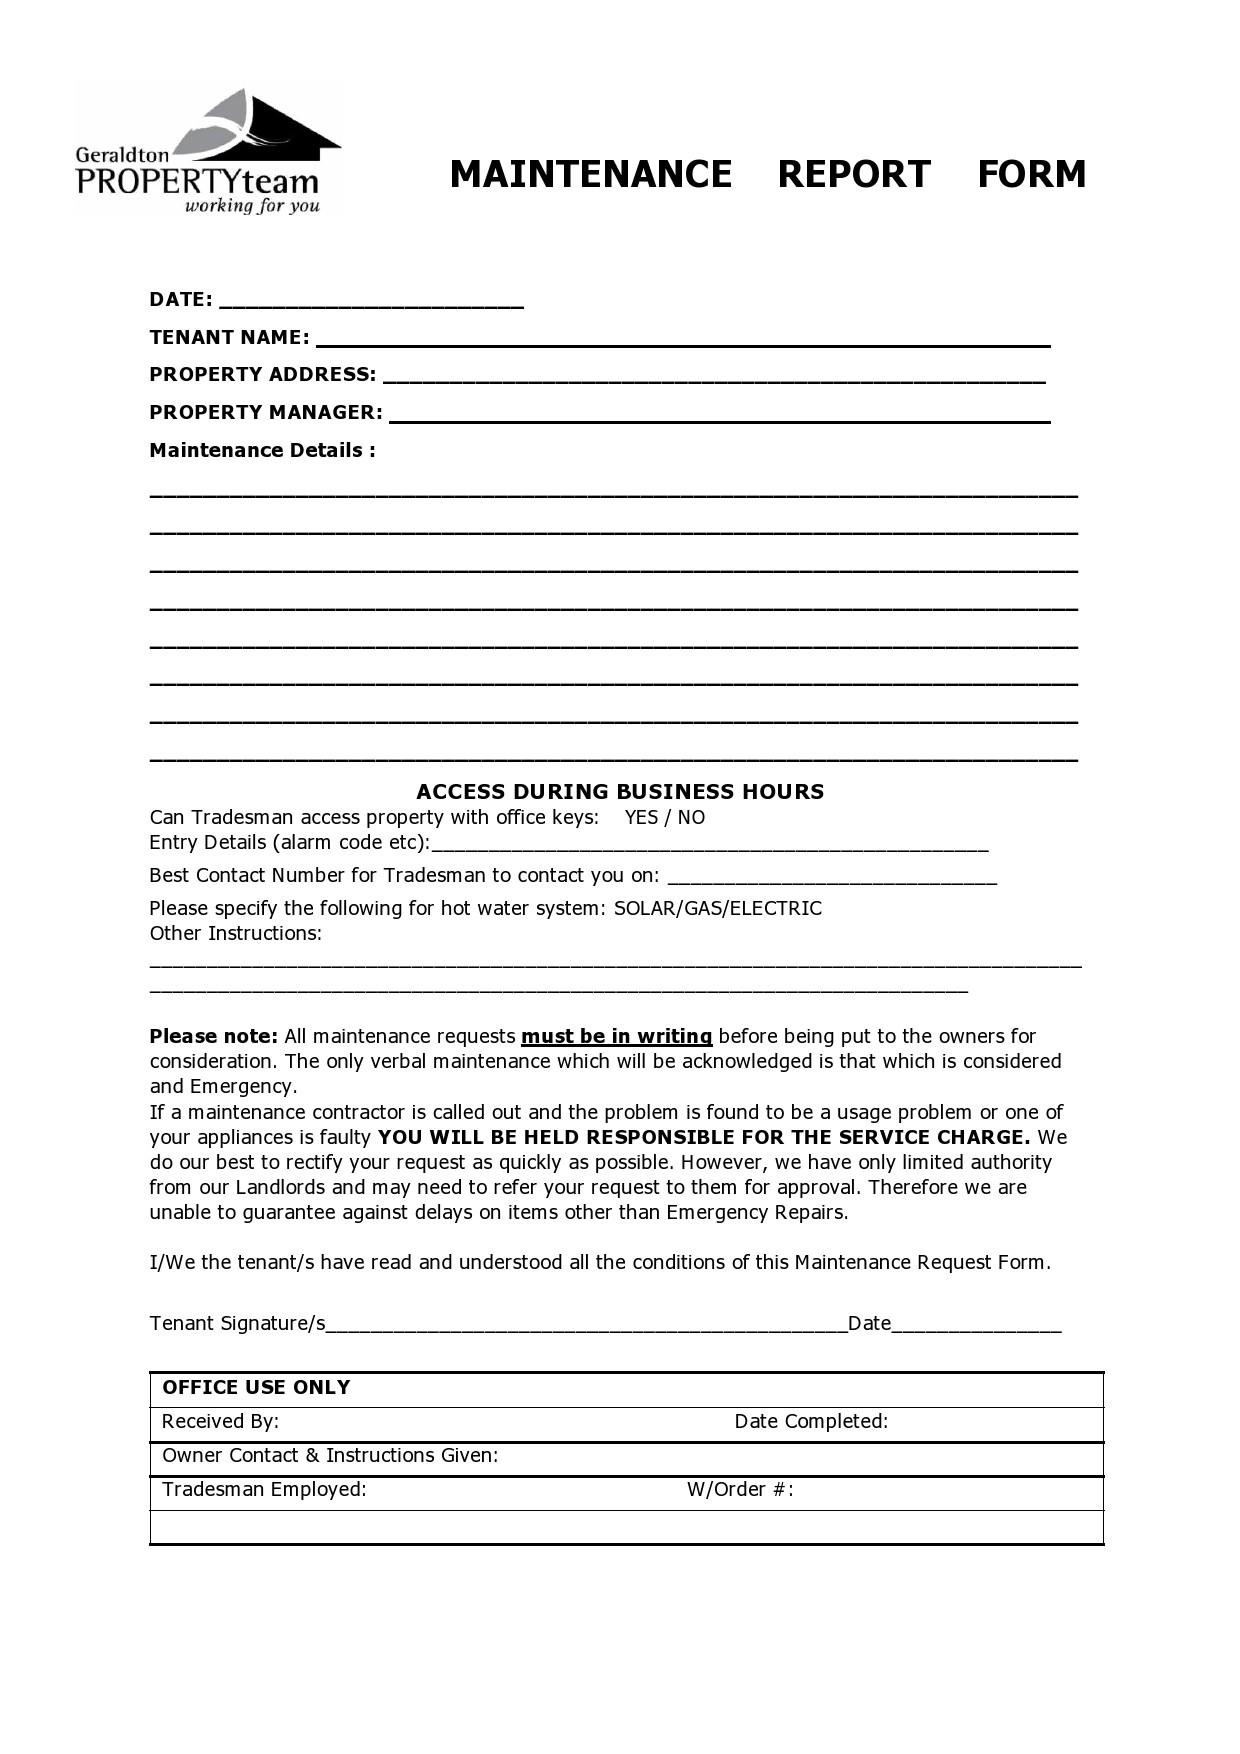 Free maintenance report form 06